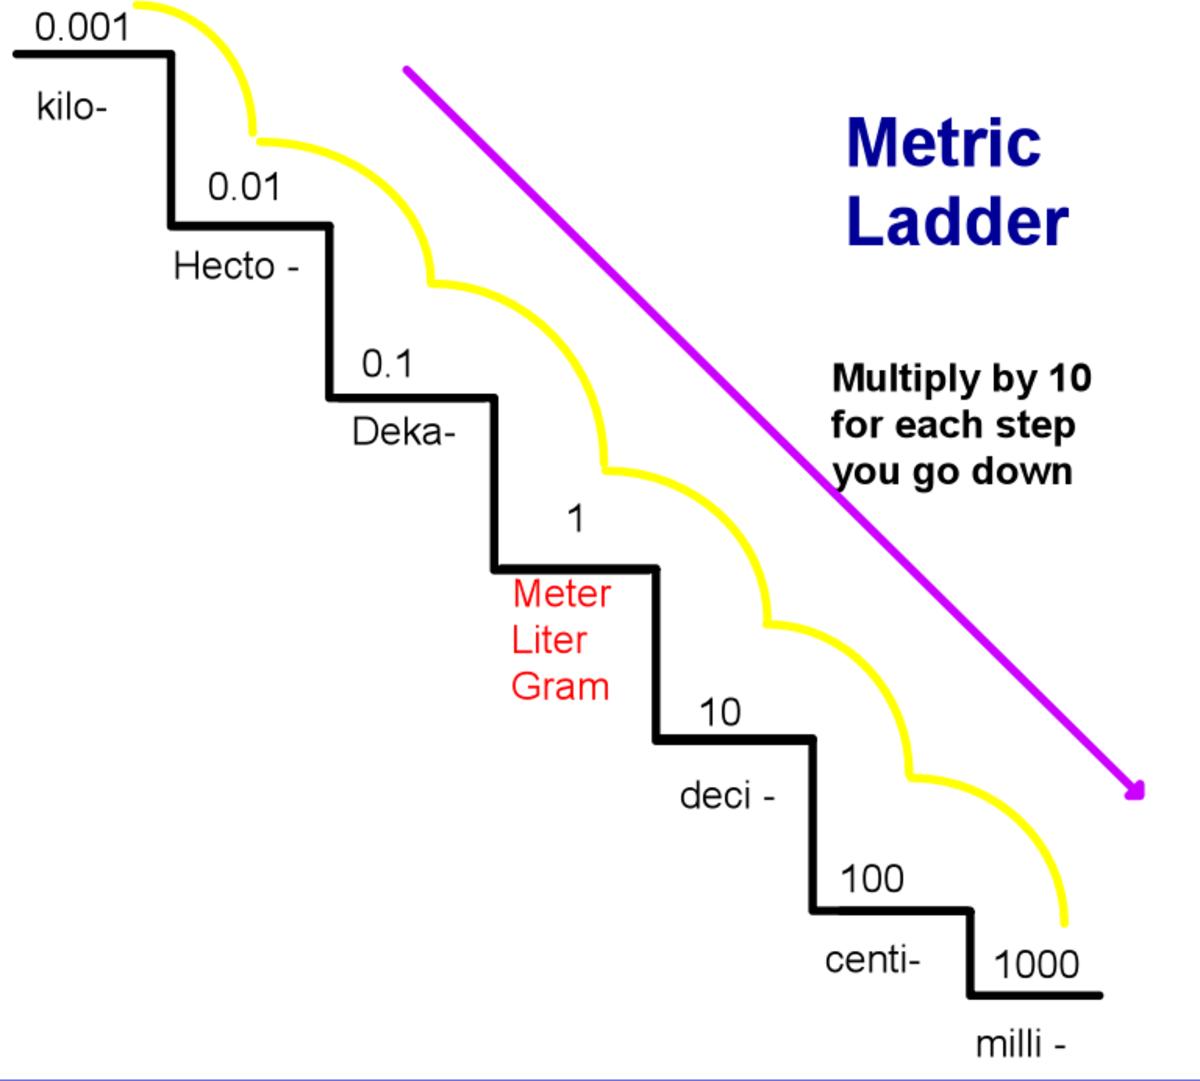 Converting Metric System